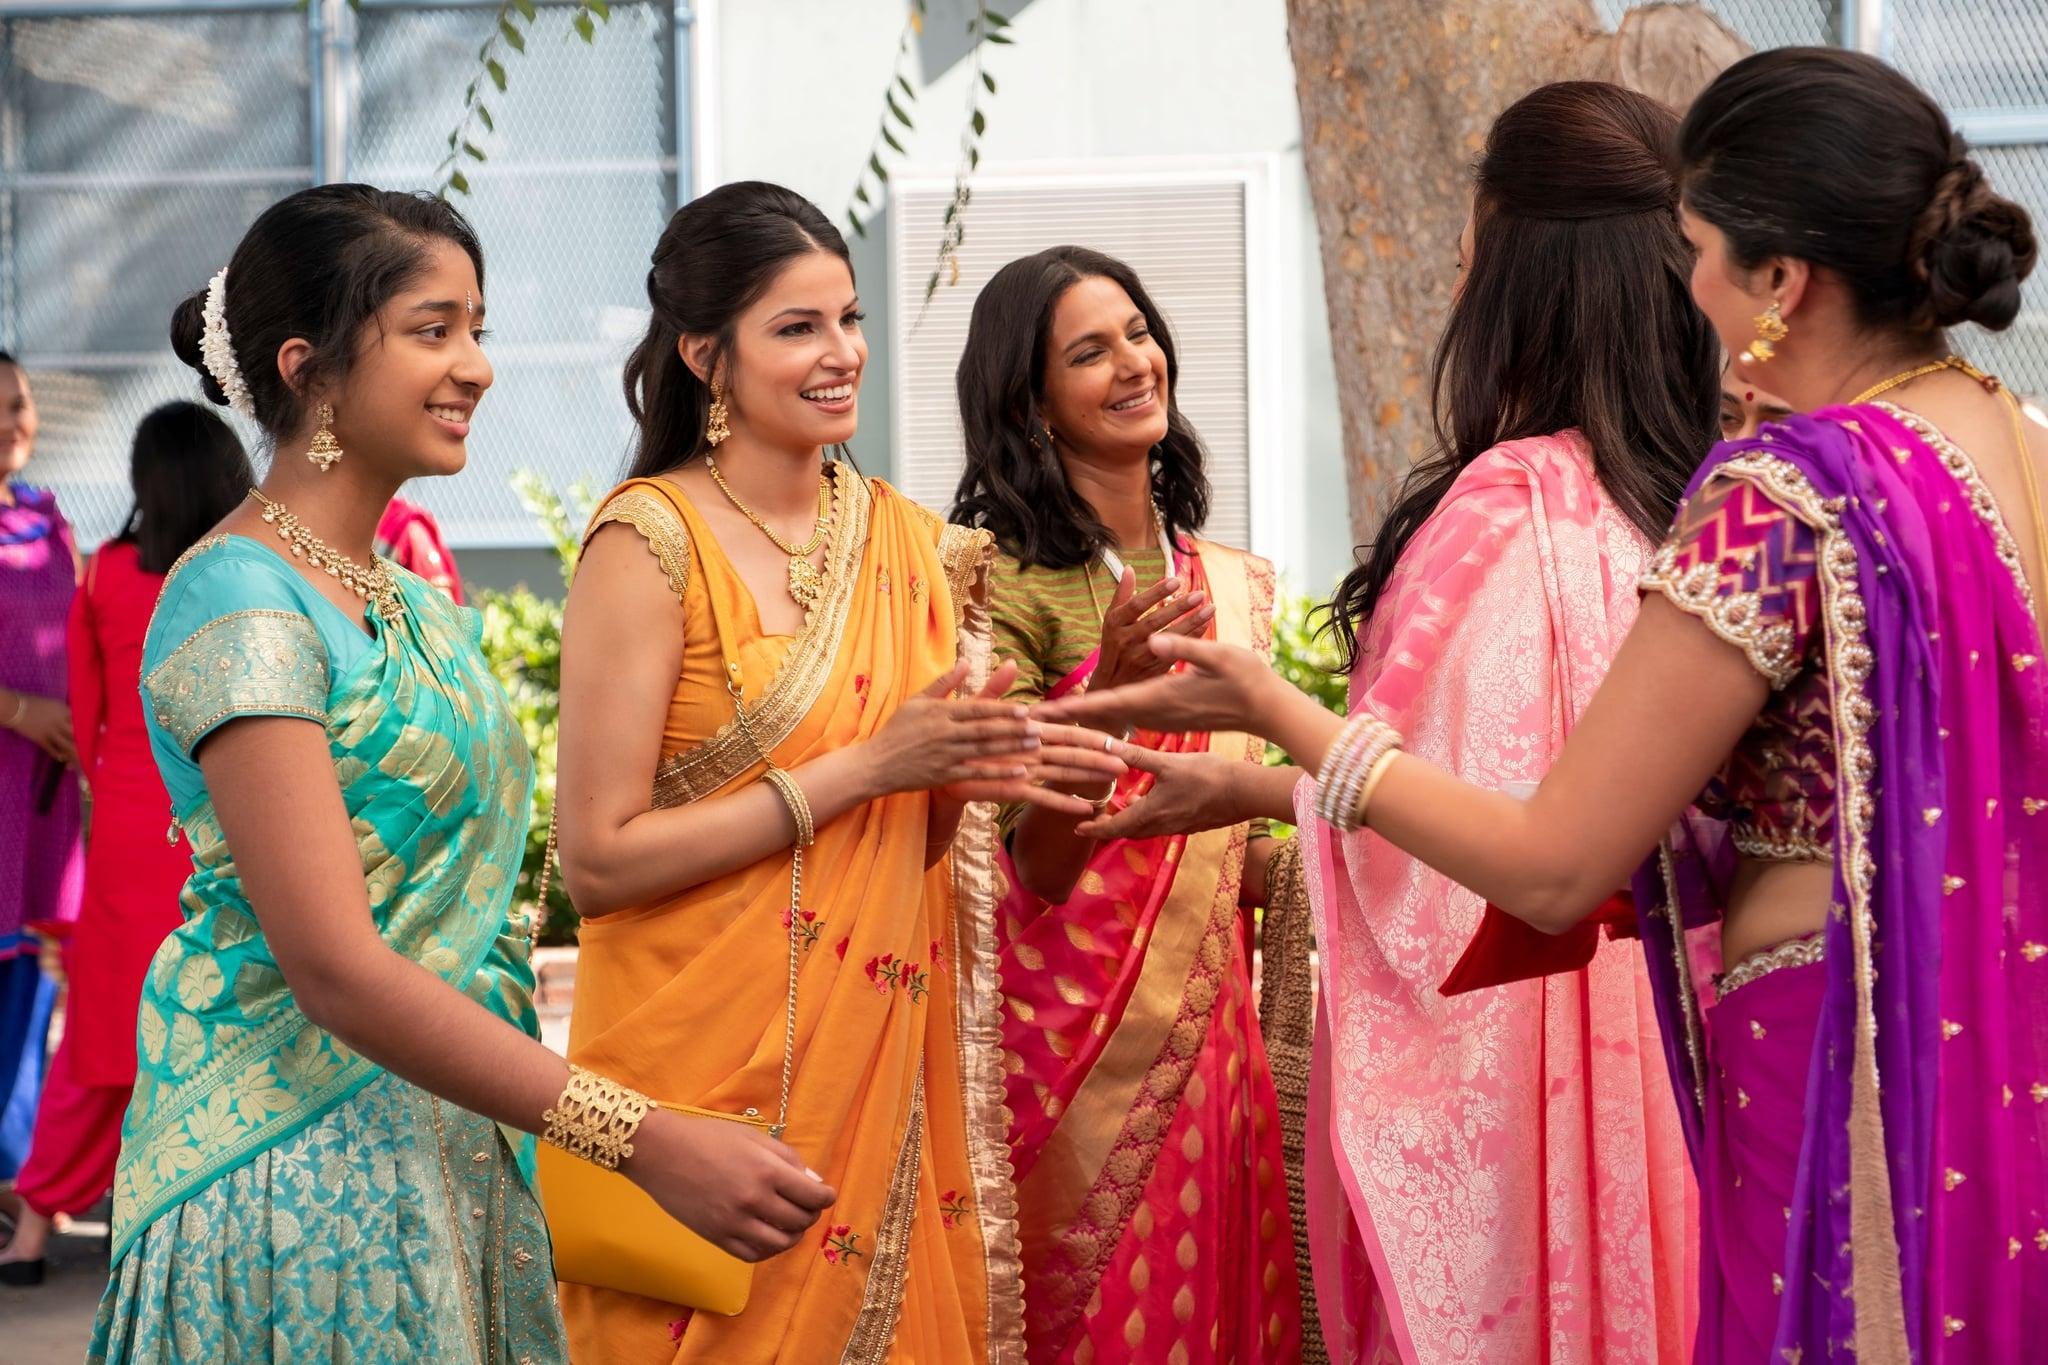 NEVER HAVE I EVER, from left: Maitreyi Ramakrishnan, Richa Sukla, Poorna Jagannathan, Alice Amter (back to camera), Sohm Kapila (back to camera), '...gotten drunk with the popular kids', (Season 1, ep. 103, aired April 27, 2020). photo: Lara Solanki /  Netflix / Courtesy Everett Collection